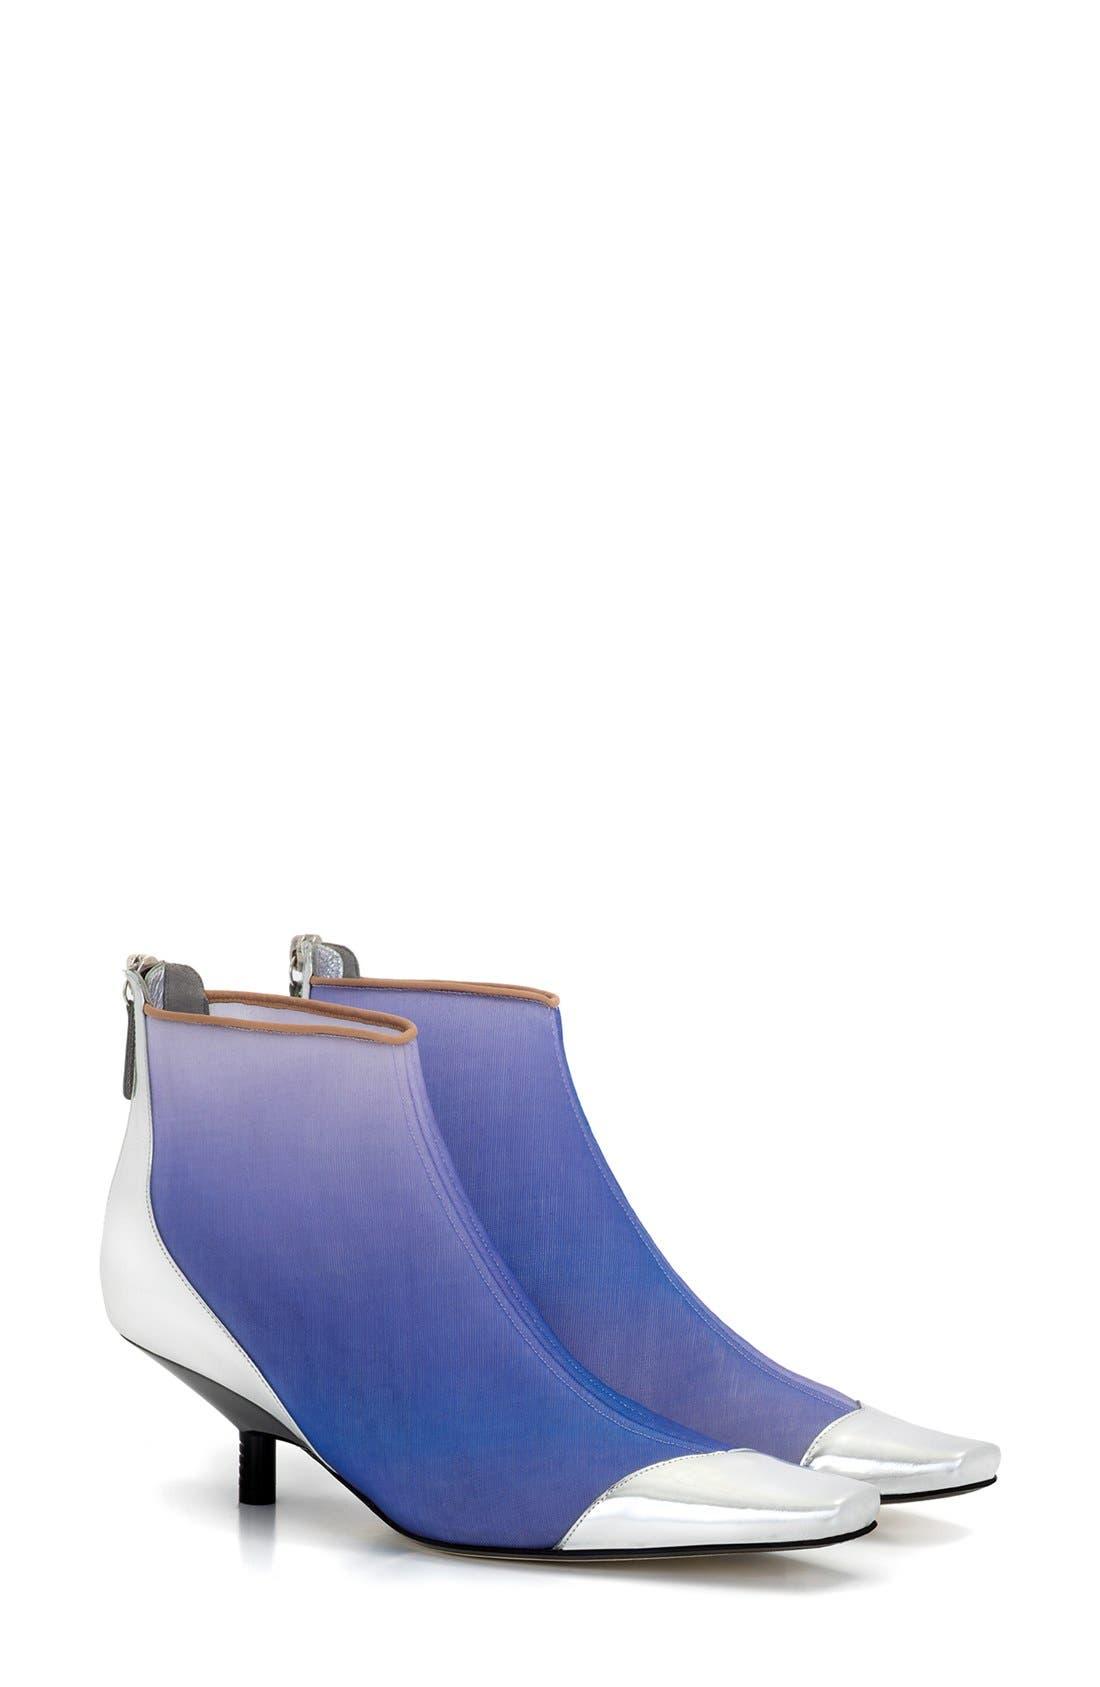 Alternate Image 1 Selected - Loewe Chelsea Boot (Women)